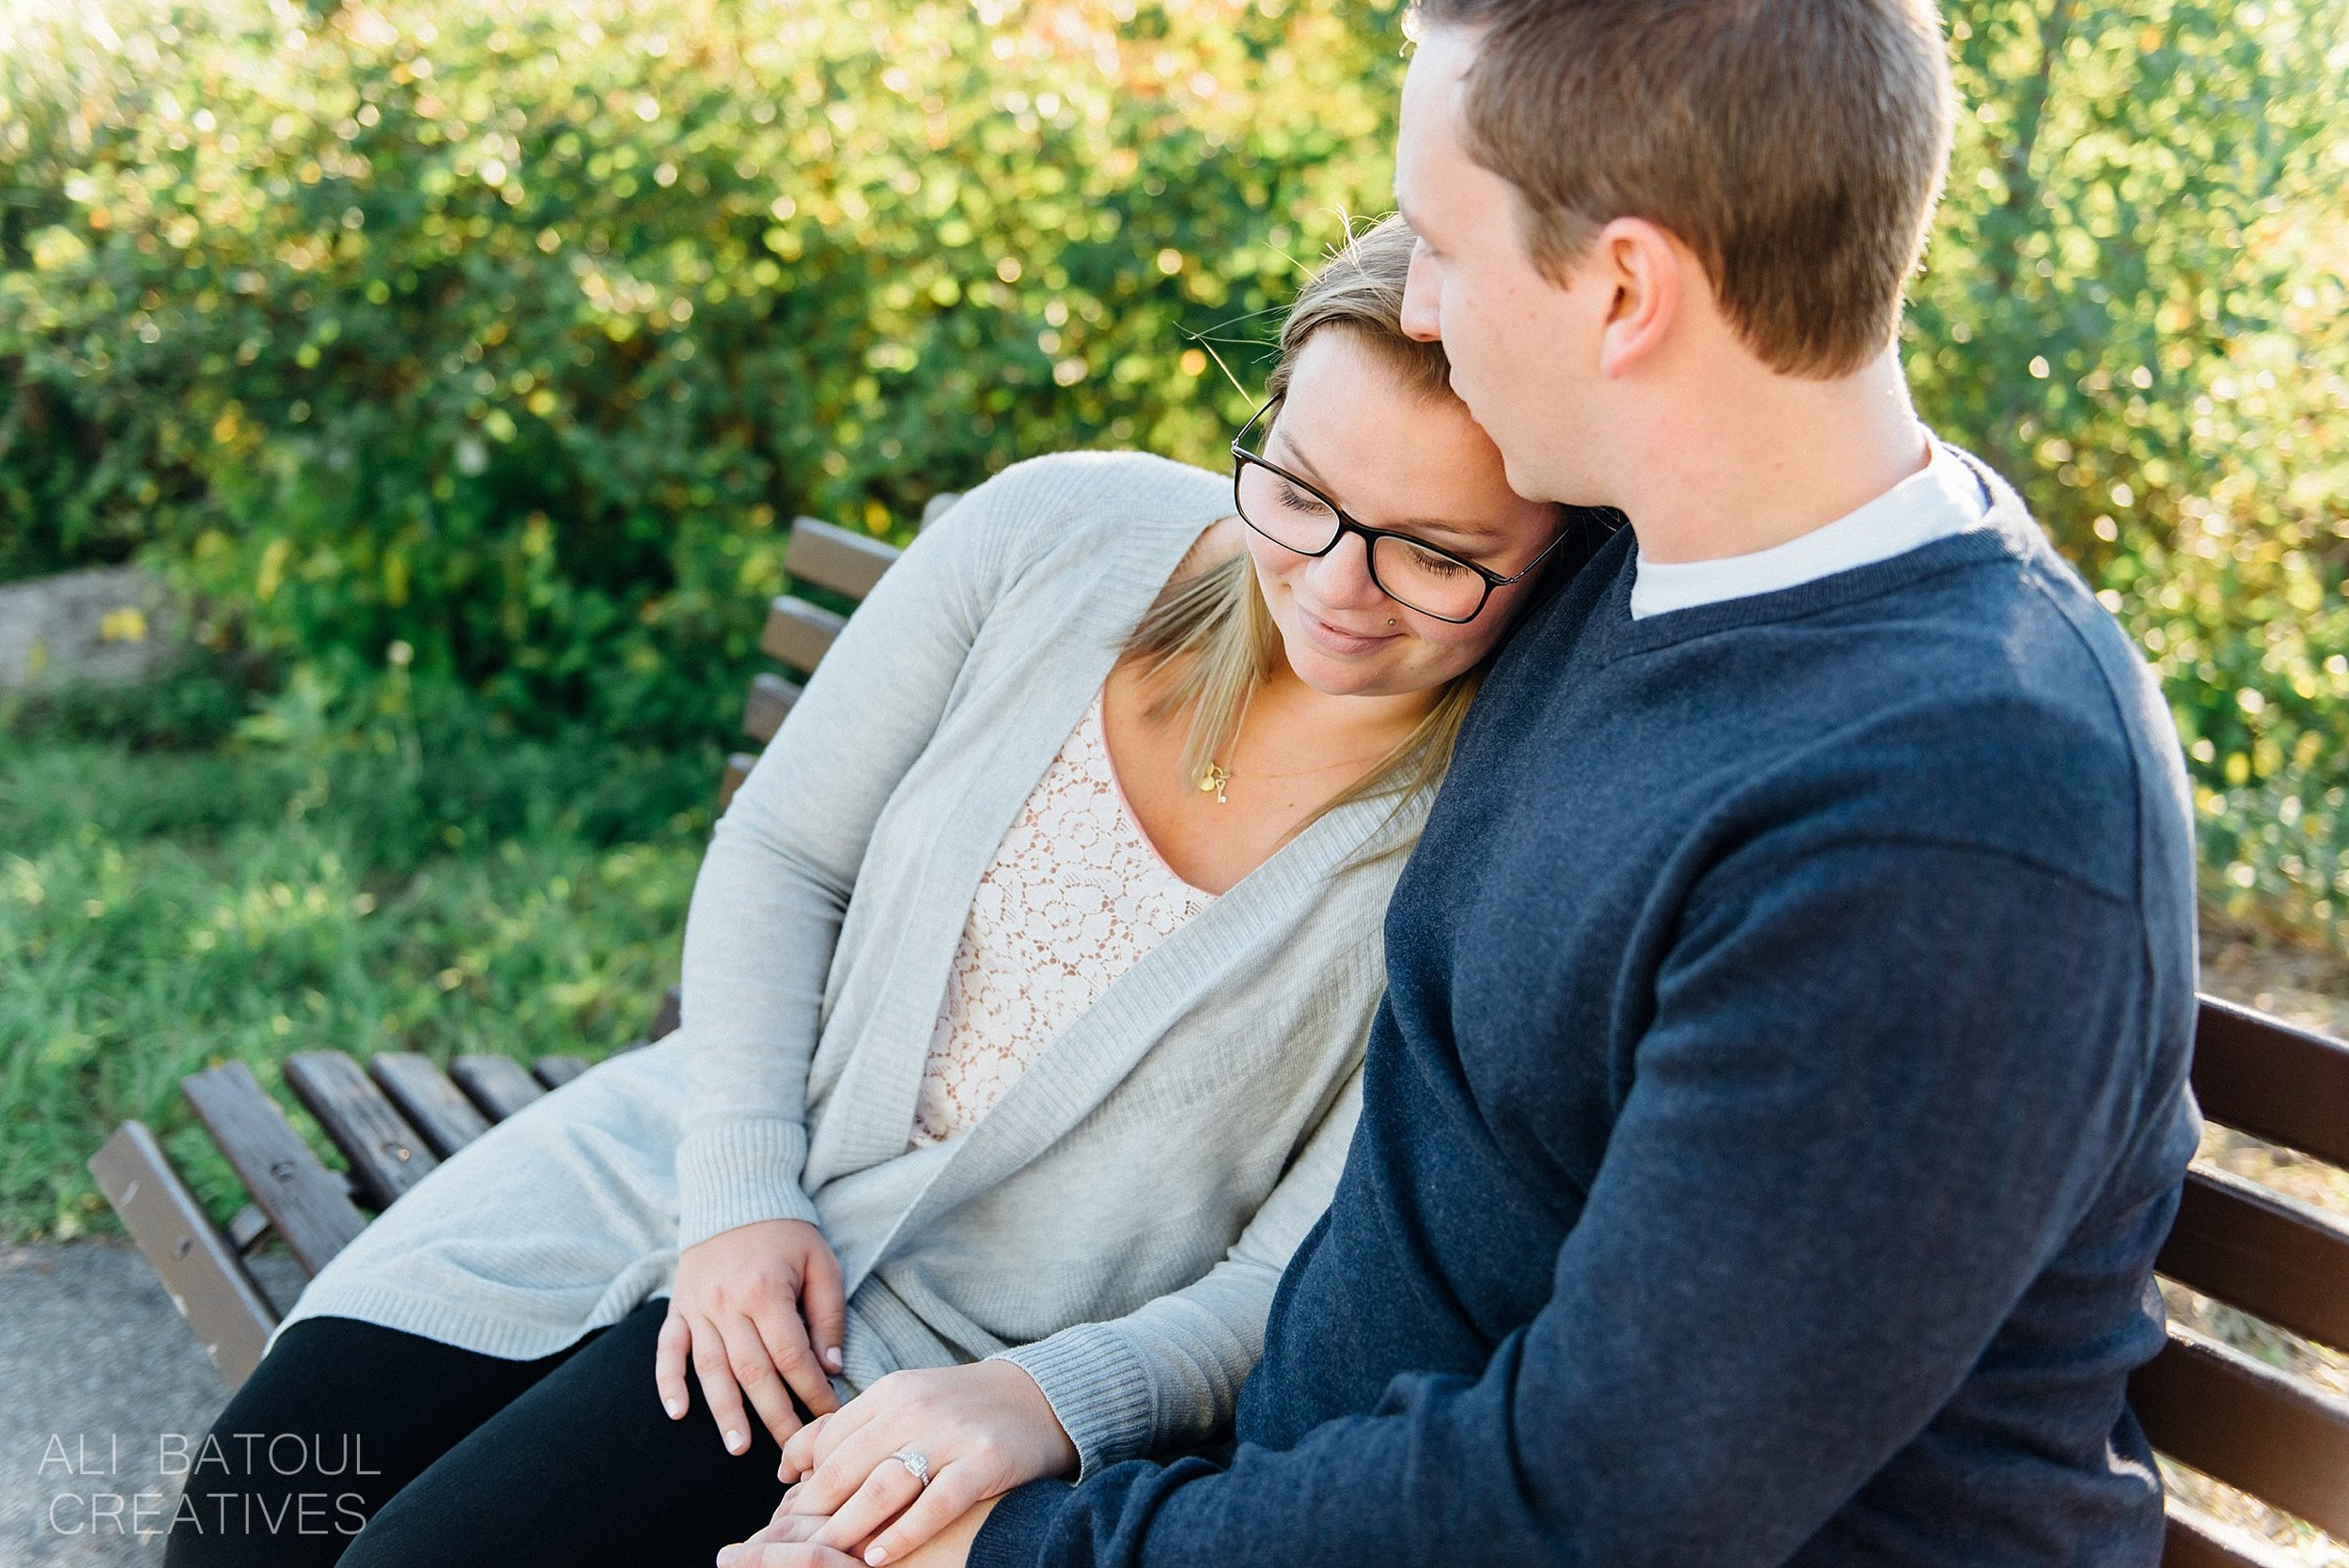 Natasha + Rich Ottawa Arboretum Engagement Photos - Ali and Batoul Fine Art Wedding Photography_0006.jpg